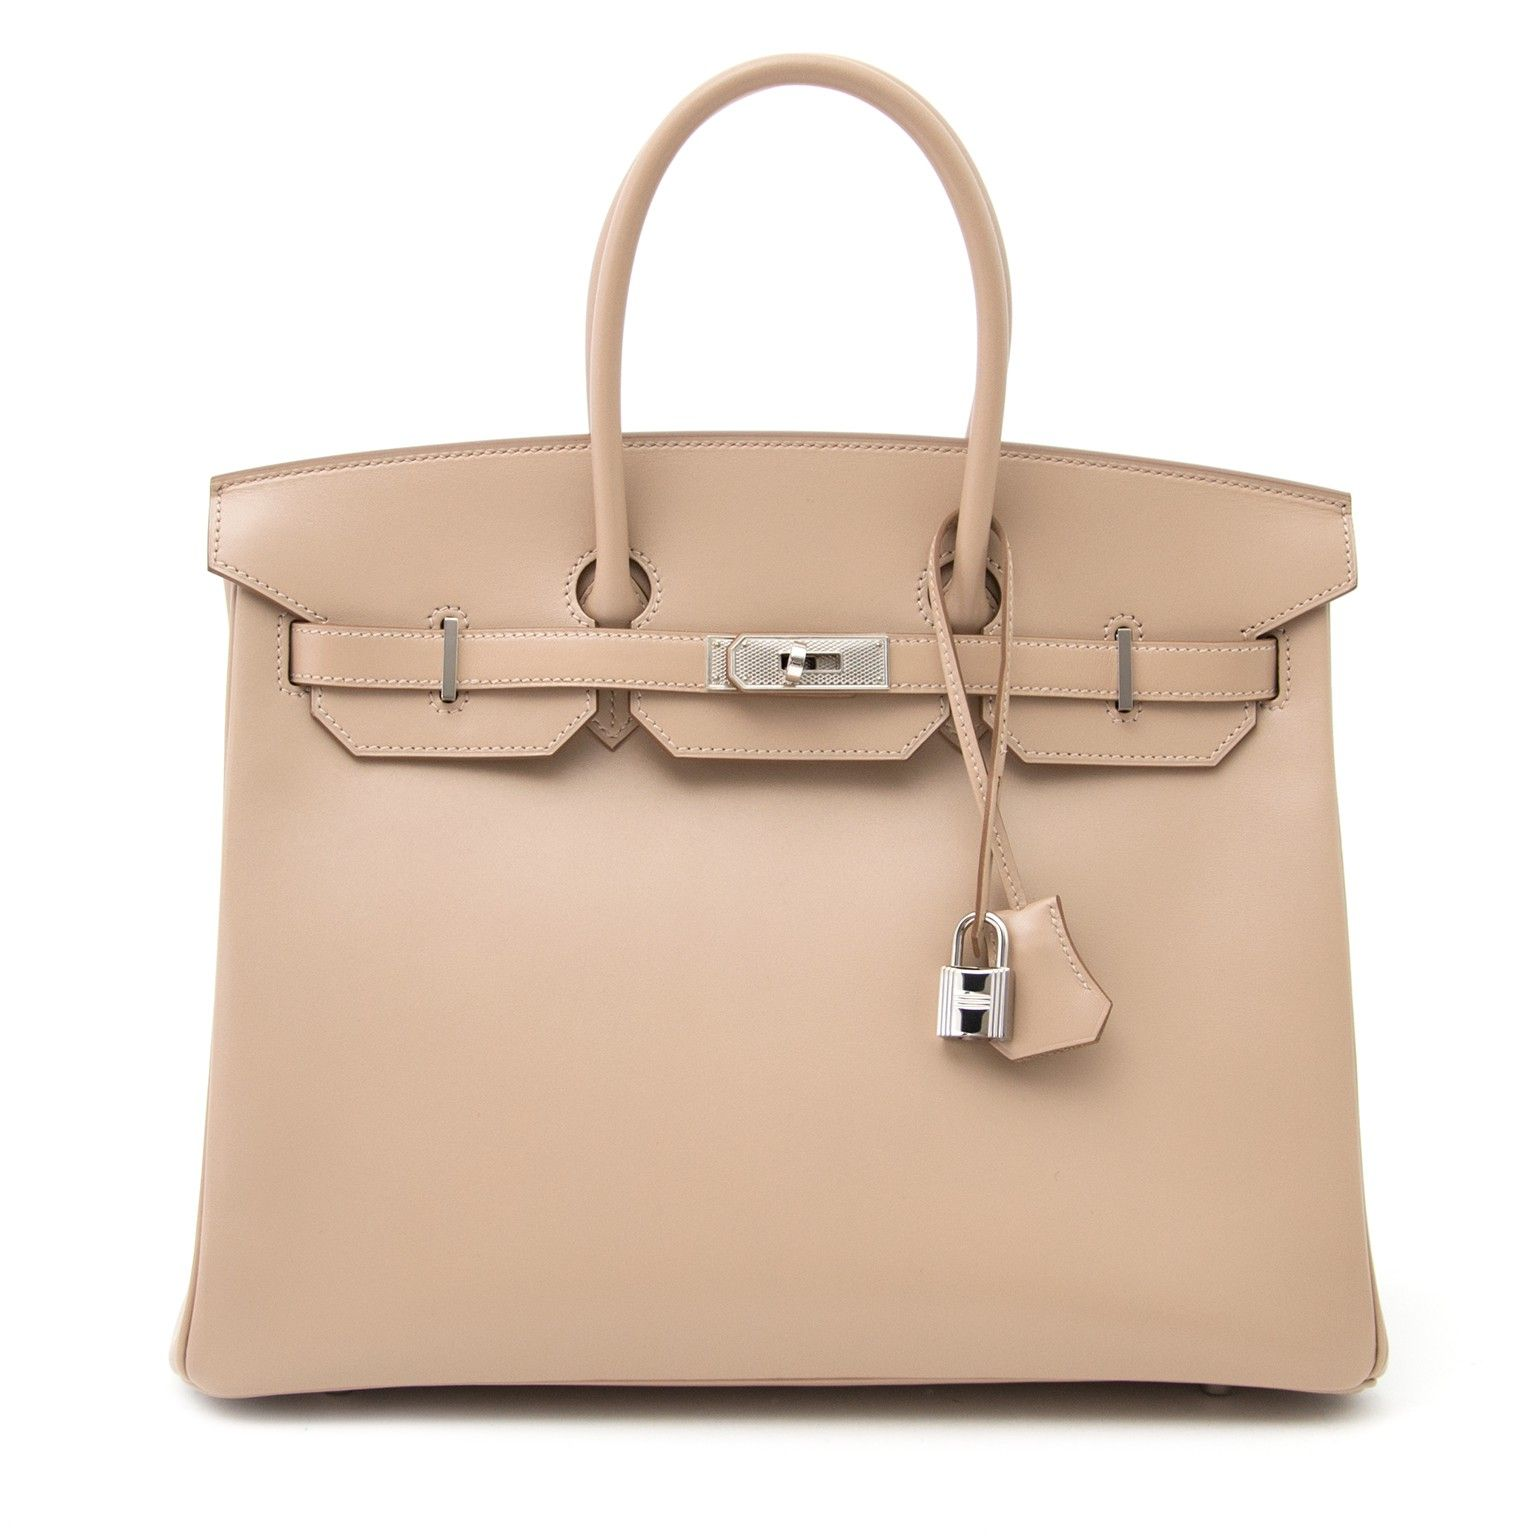 f4368d90b5 Hermès birkin 35 Guilloche Tadelakt Argile phw now online at labellov.com